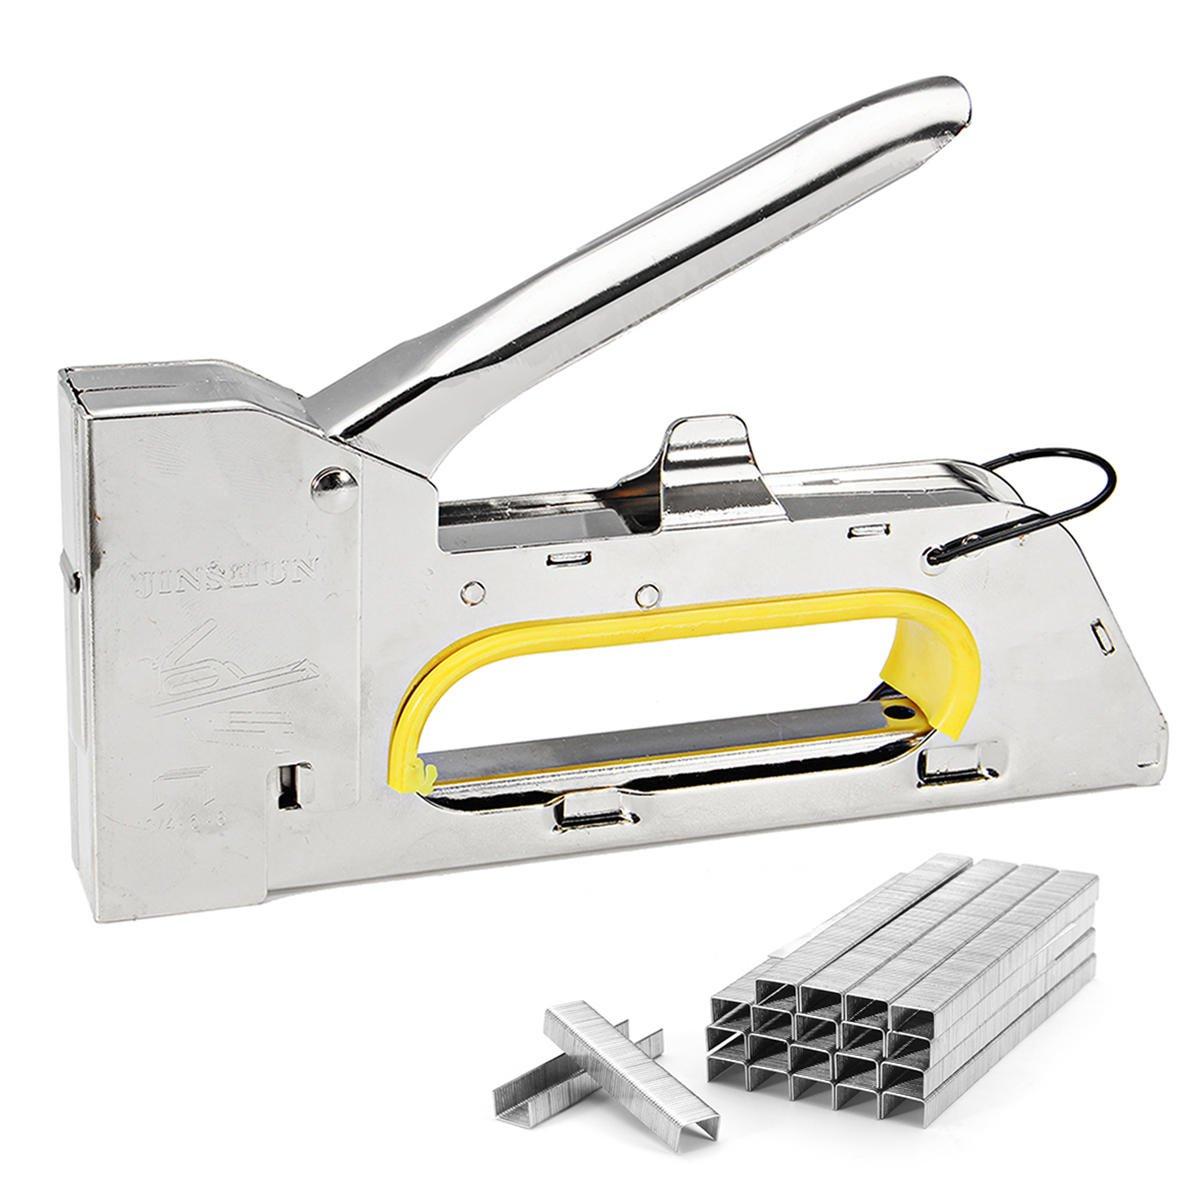 4-6-8mm Handy Heavy Duty Paper Furniture Staple Gun Tacker Stapler with 2400 Staples